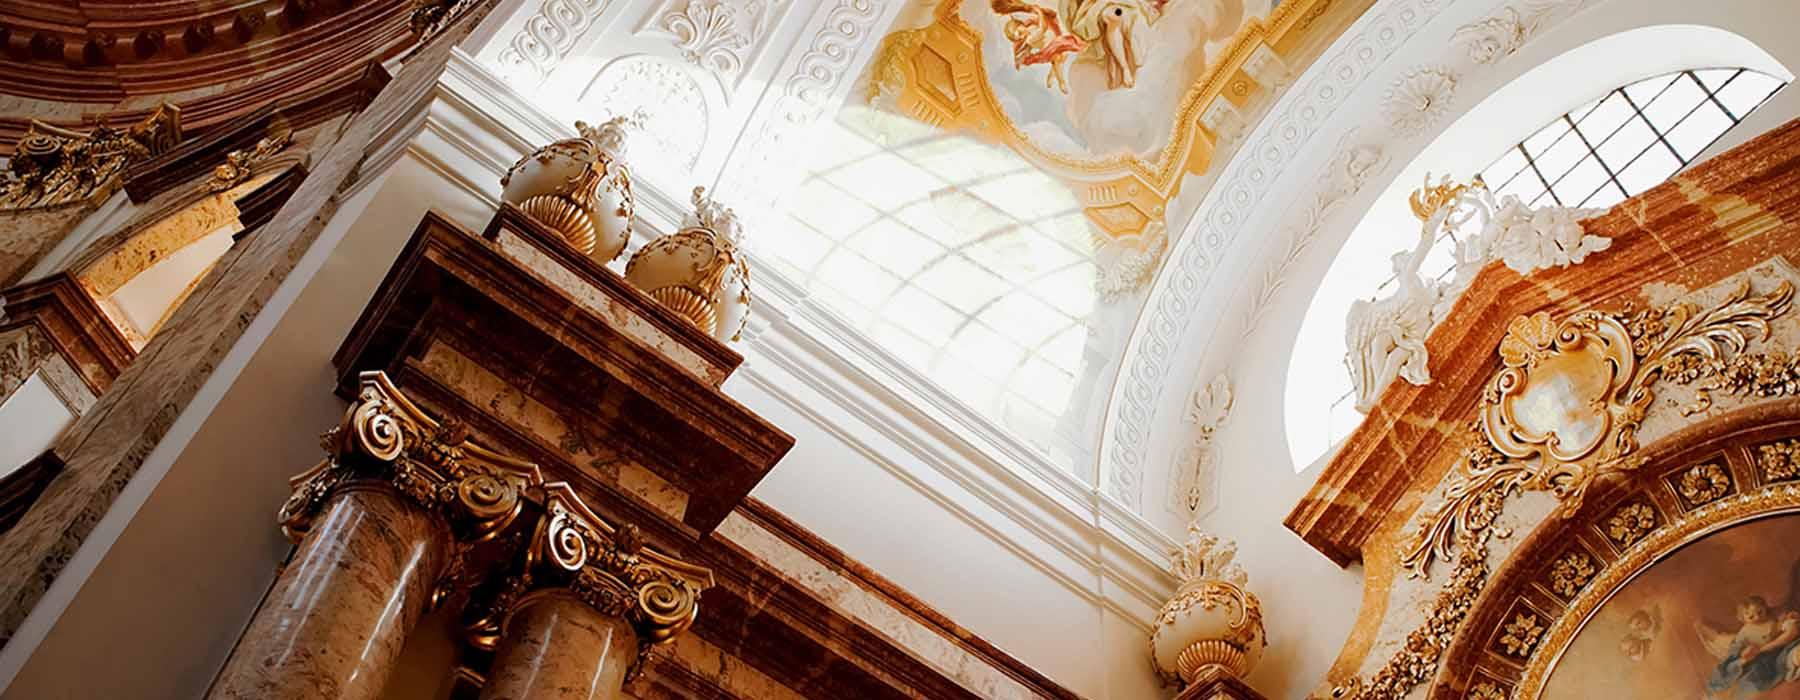 vacances autriche Accueil u003e Destination u003e Autriche